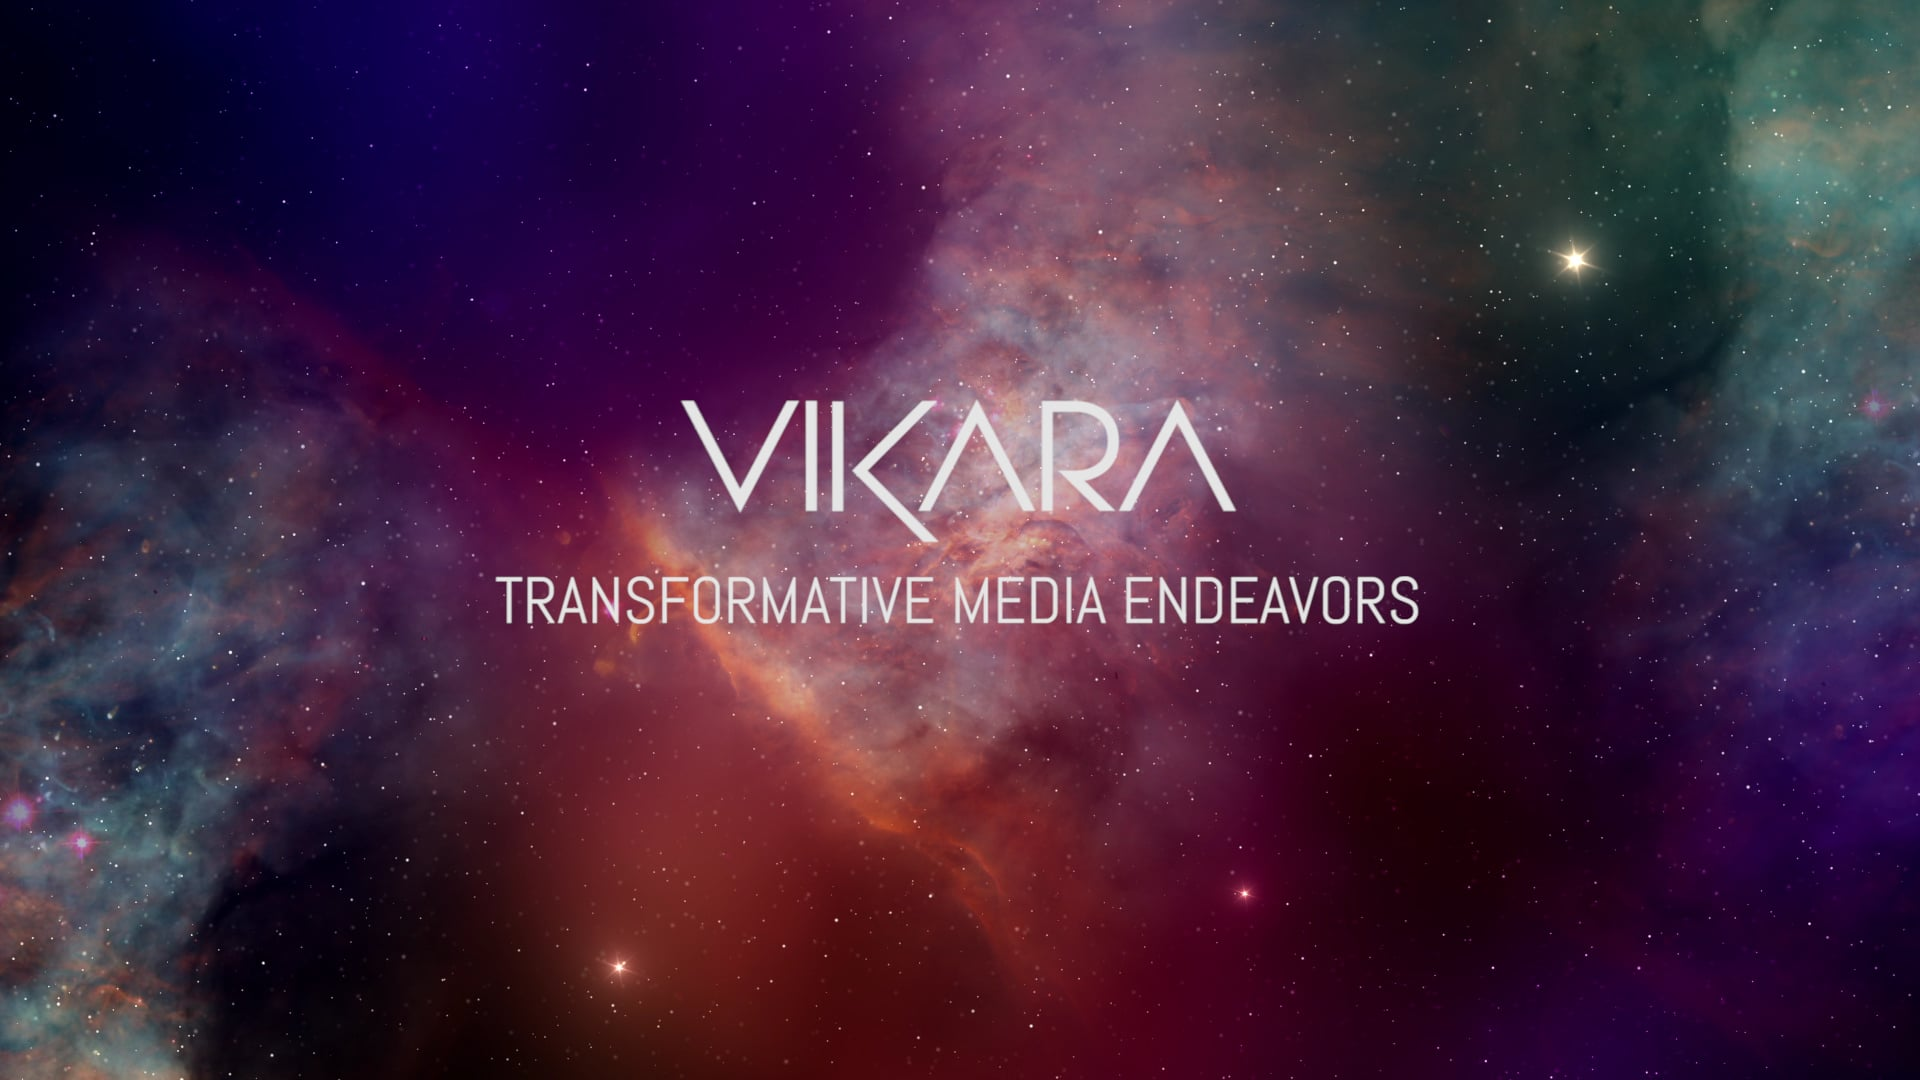 VIKARA Launch